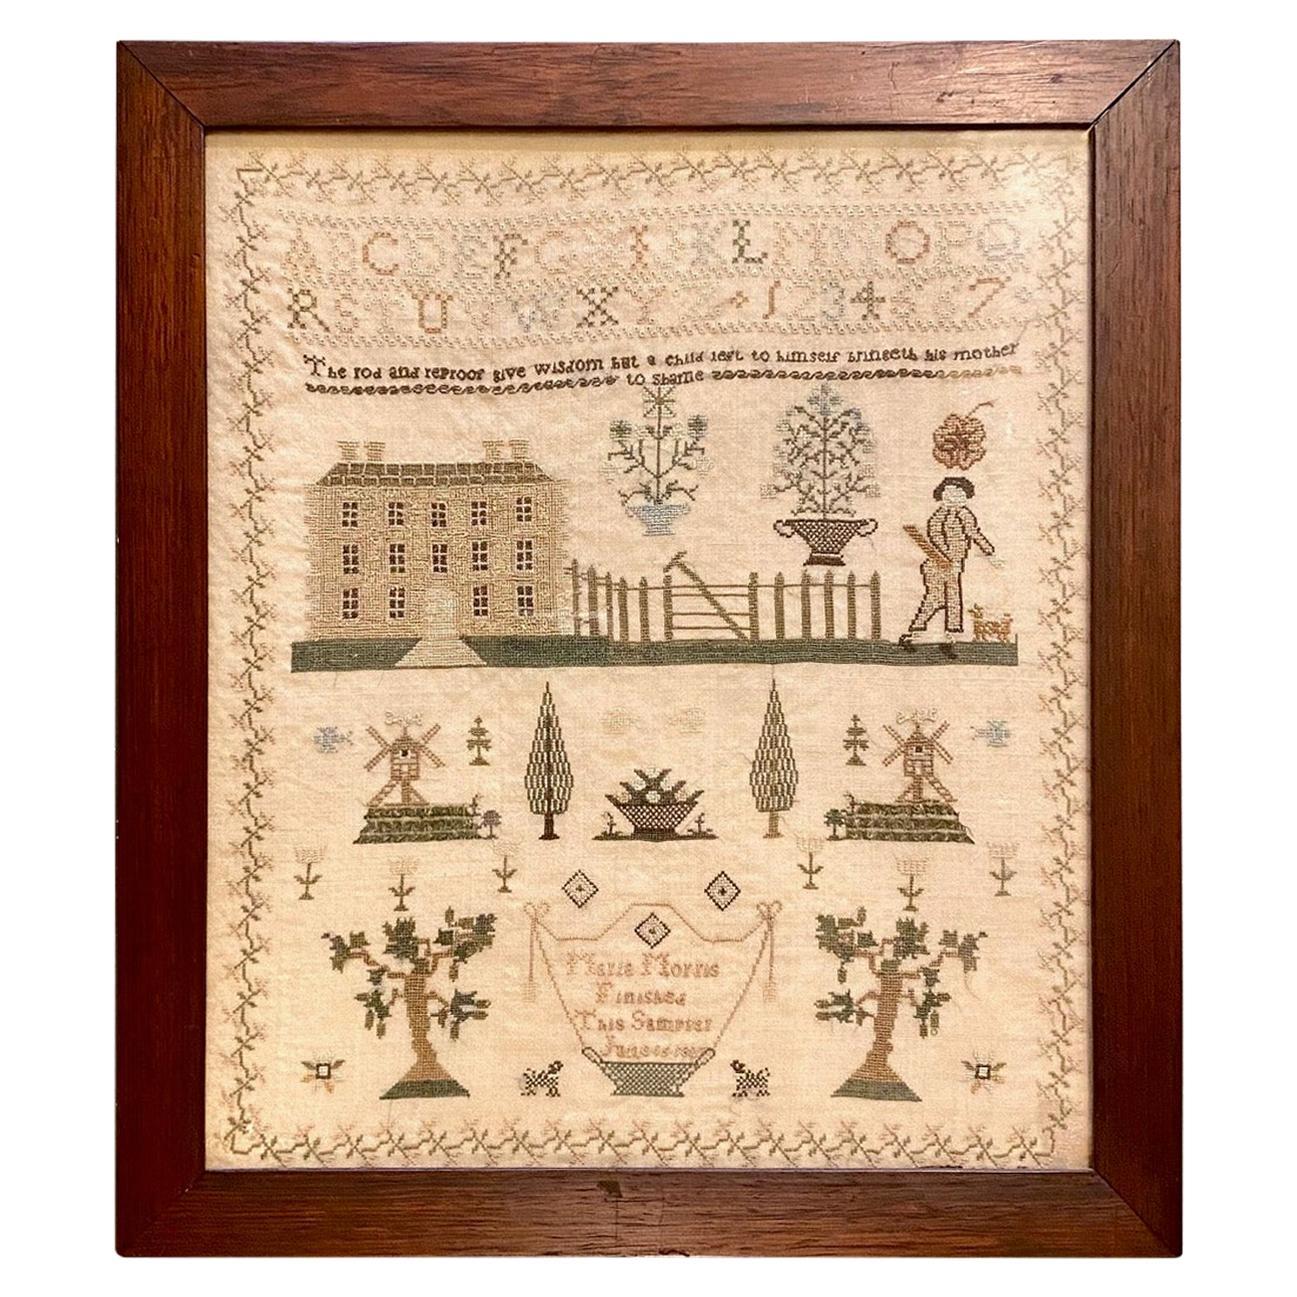 American Needlework Sampler by Maria Morris, 1827